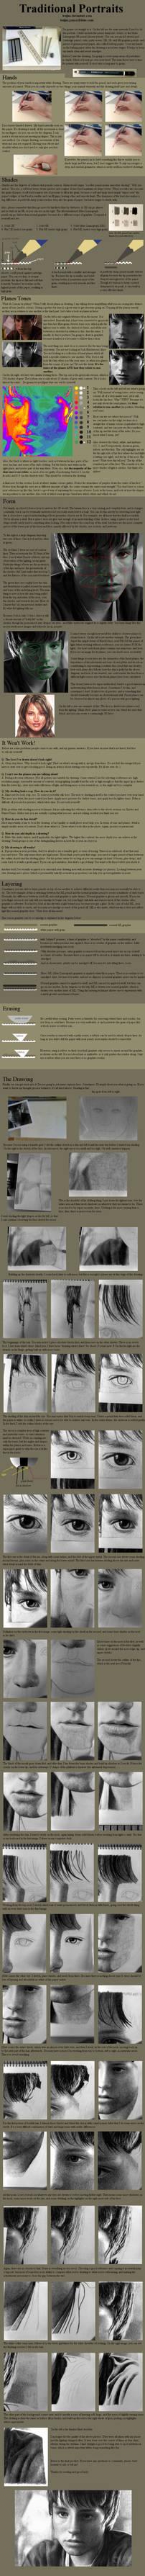 Tutorial - Graphite:Portraits